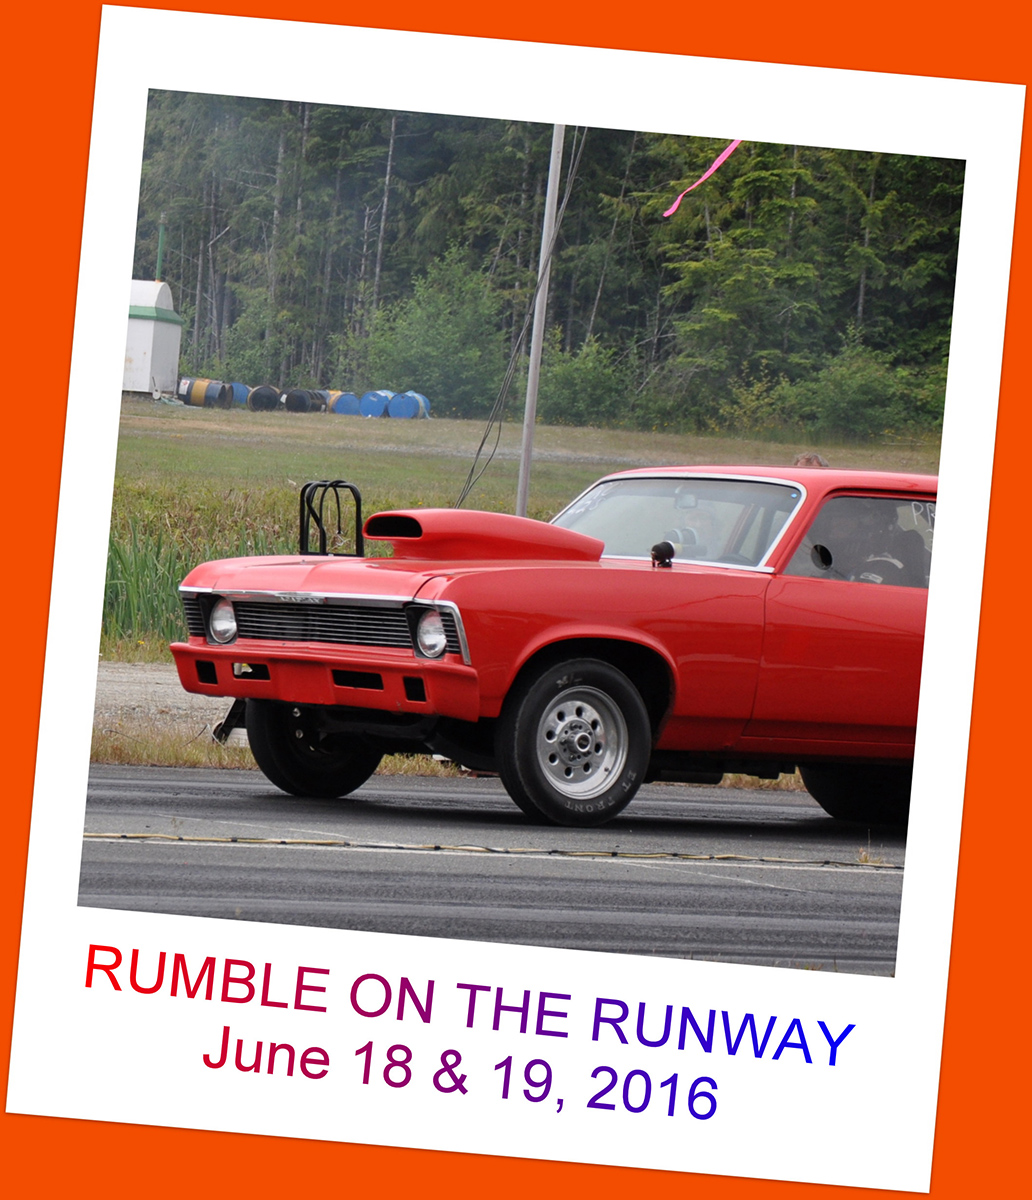 Rumble on the Runway June 18 & 19, 2016 1210